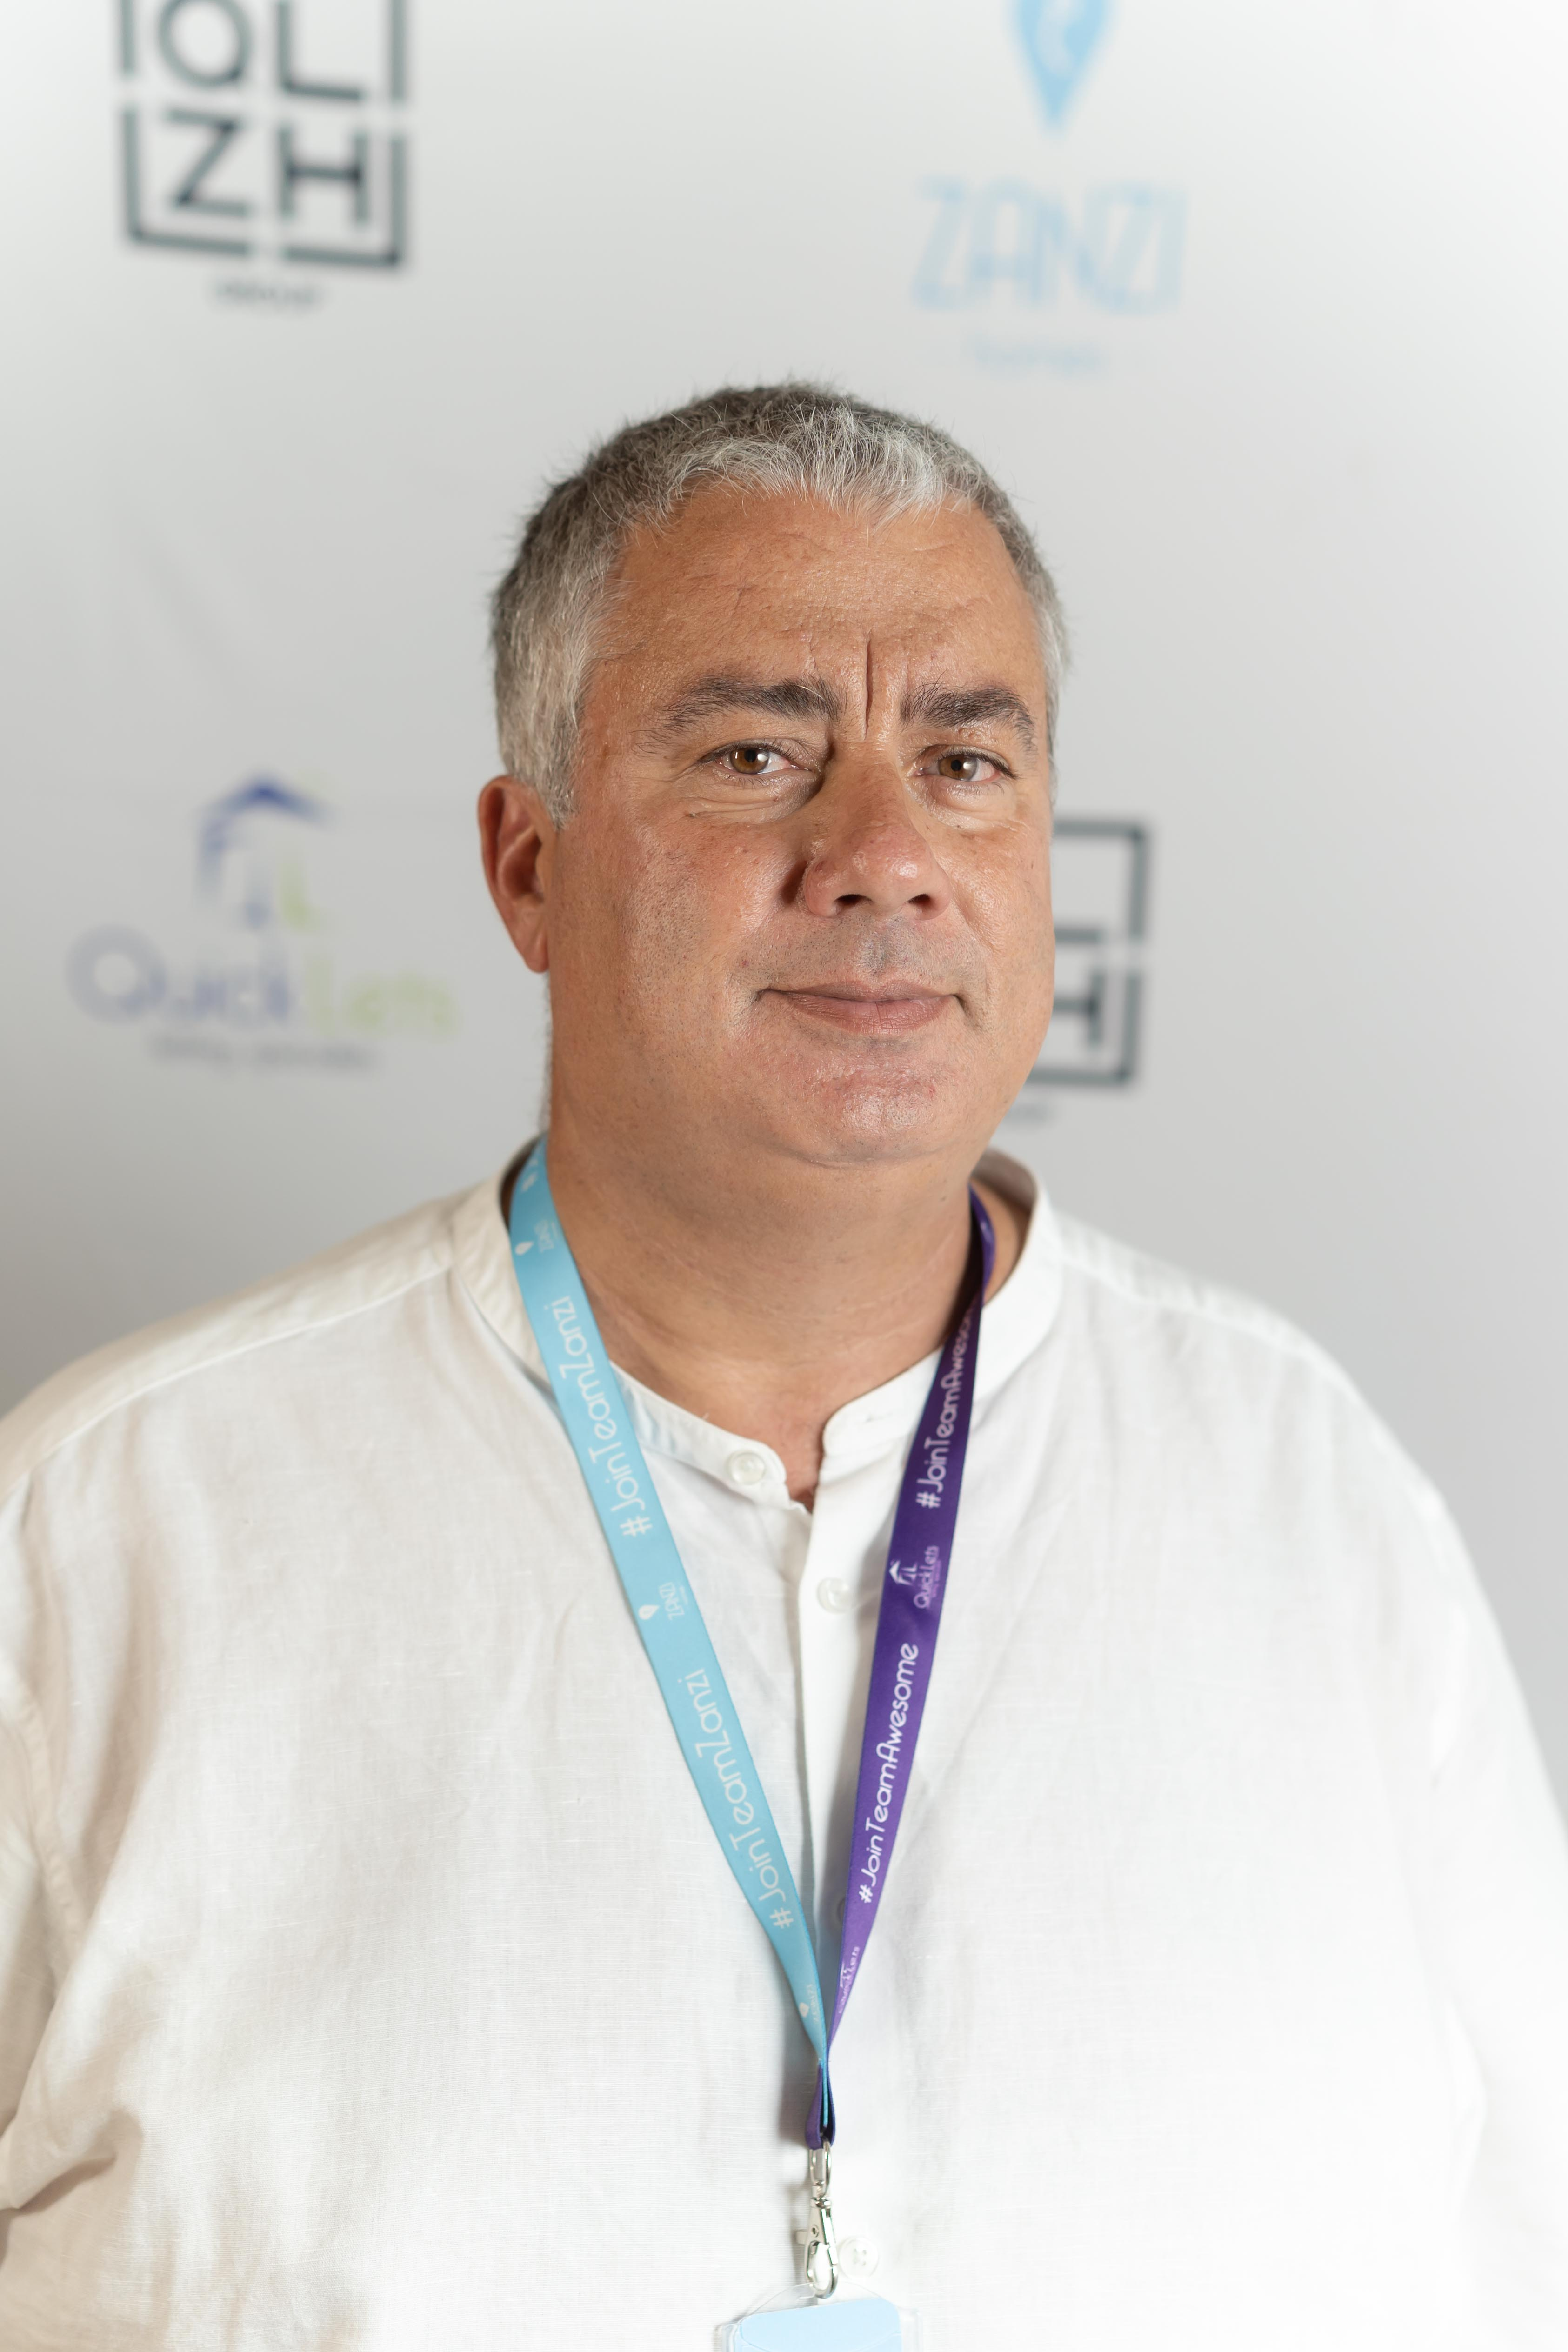 Sandro Bianchi